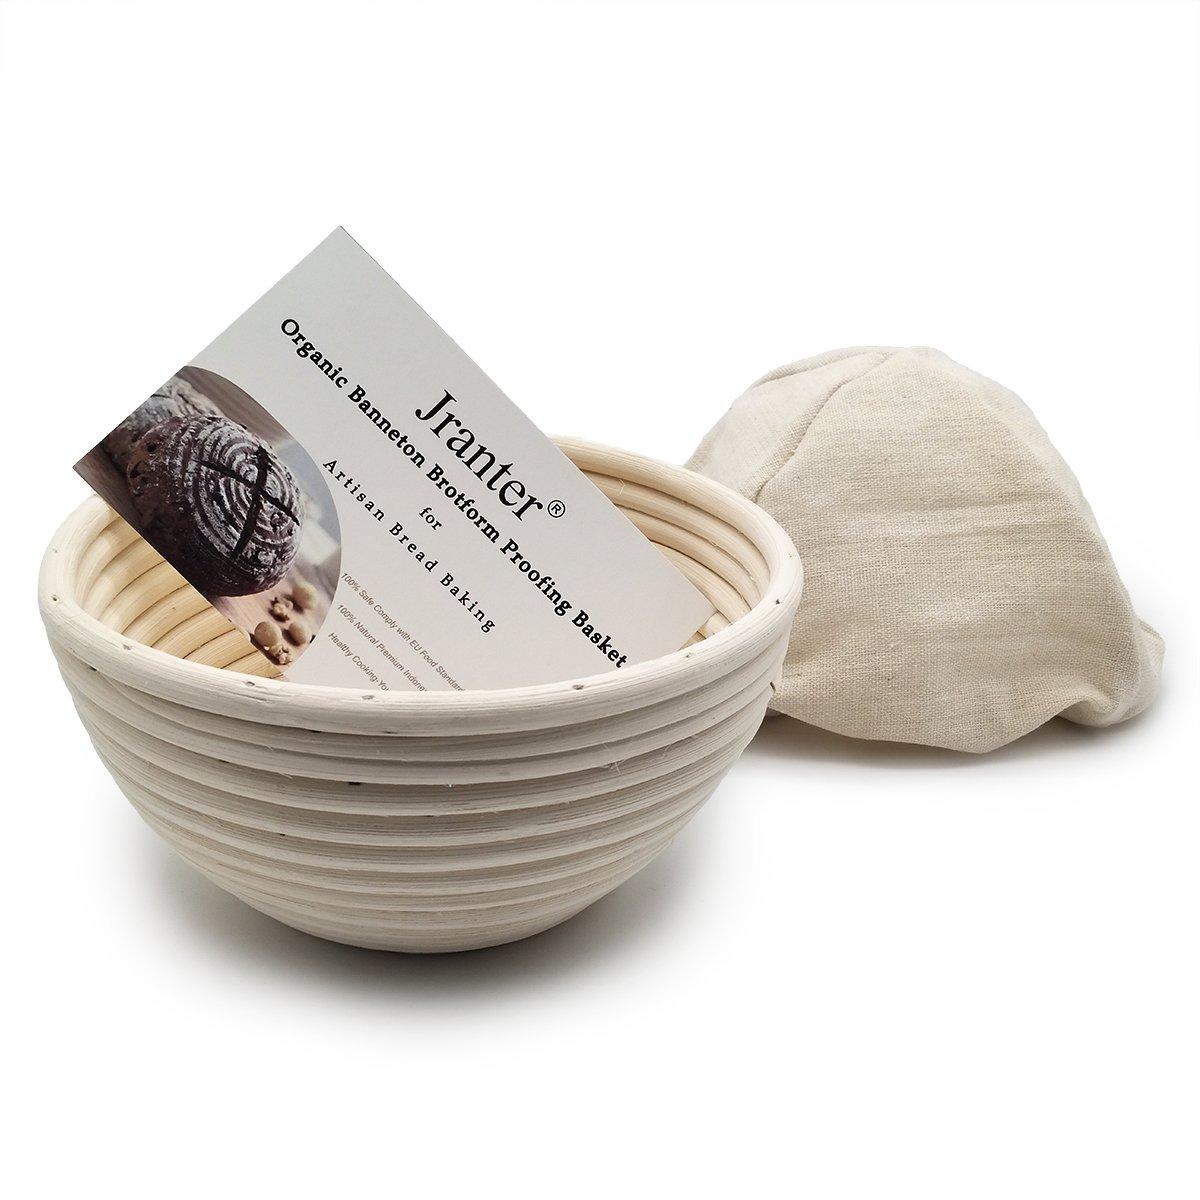 Dgtek 4 pcs 7 inch Round Banneton Brotform Bread Proofing Basket Natural Rattan Cane Handmade & Linen Liner Cloth